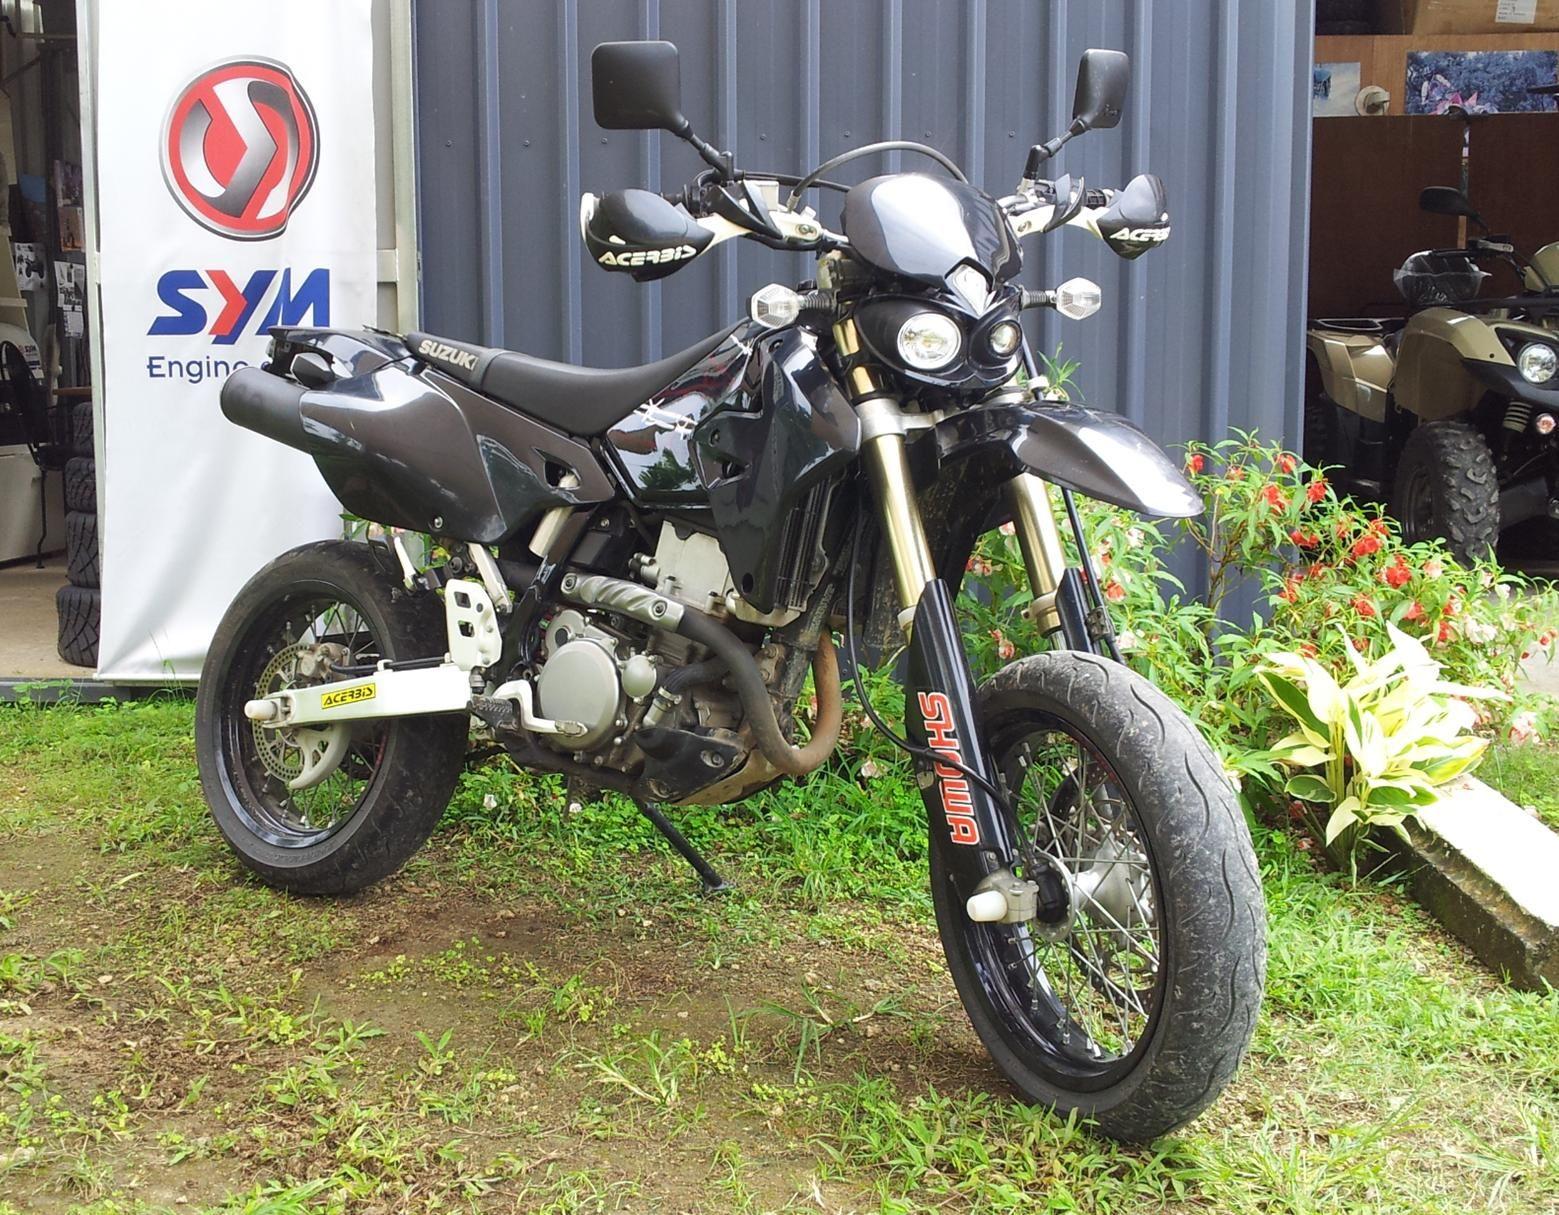 2001 drz 400 supermoto wheels | Home / Used vehicle / Used motorbike Suzuki  DRZ 400 SM